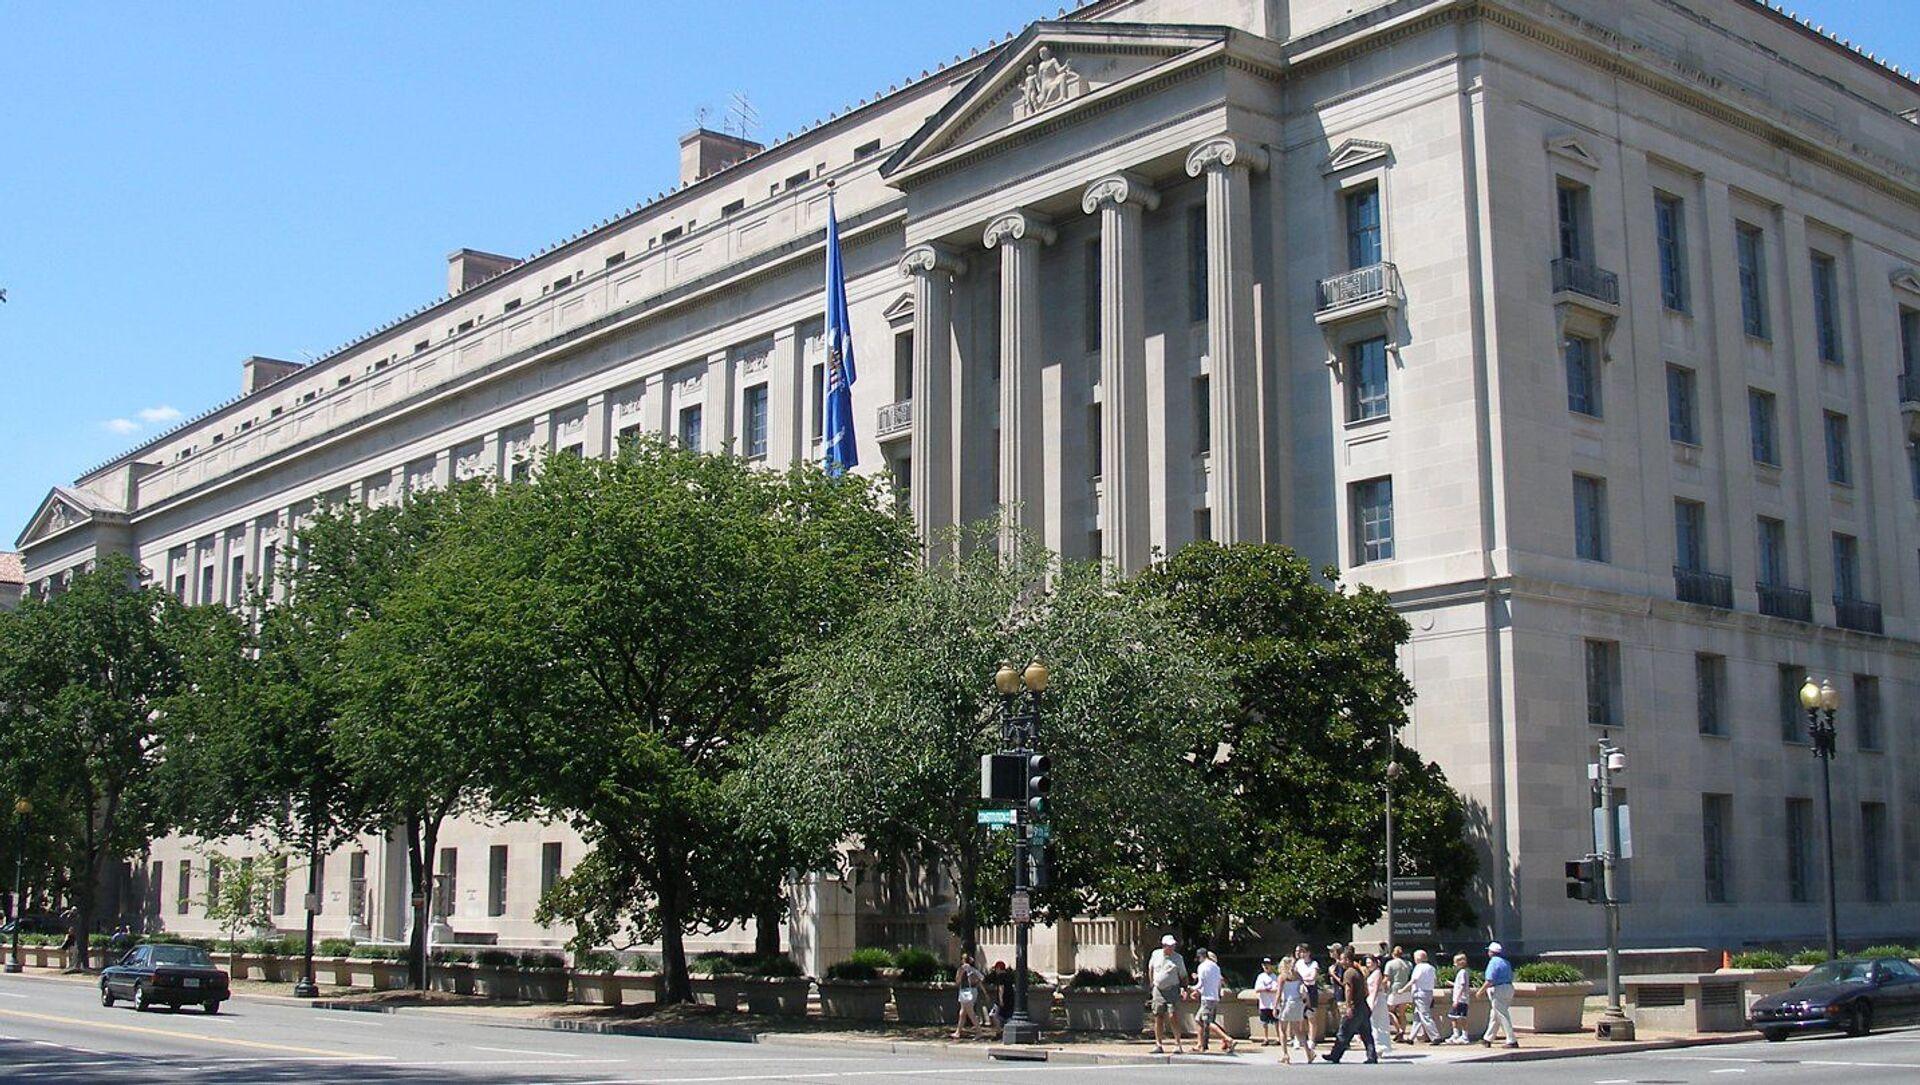 Dipartimento di Giustizia USA a Washington - Sputnik Italia, 1920, 20.02.2021